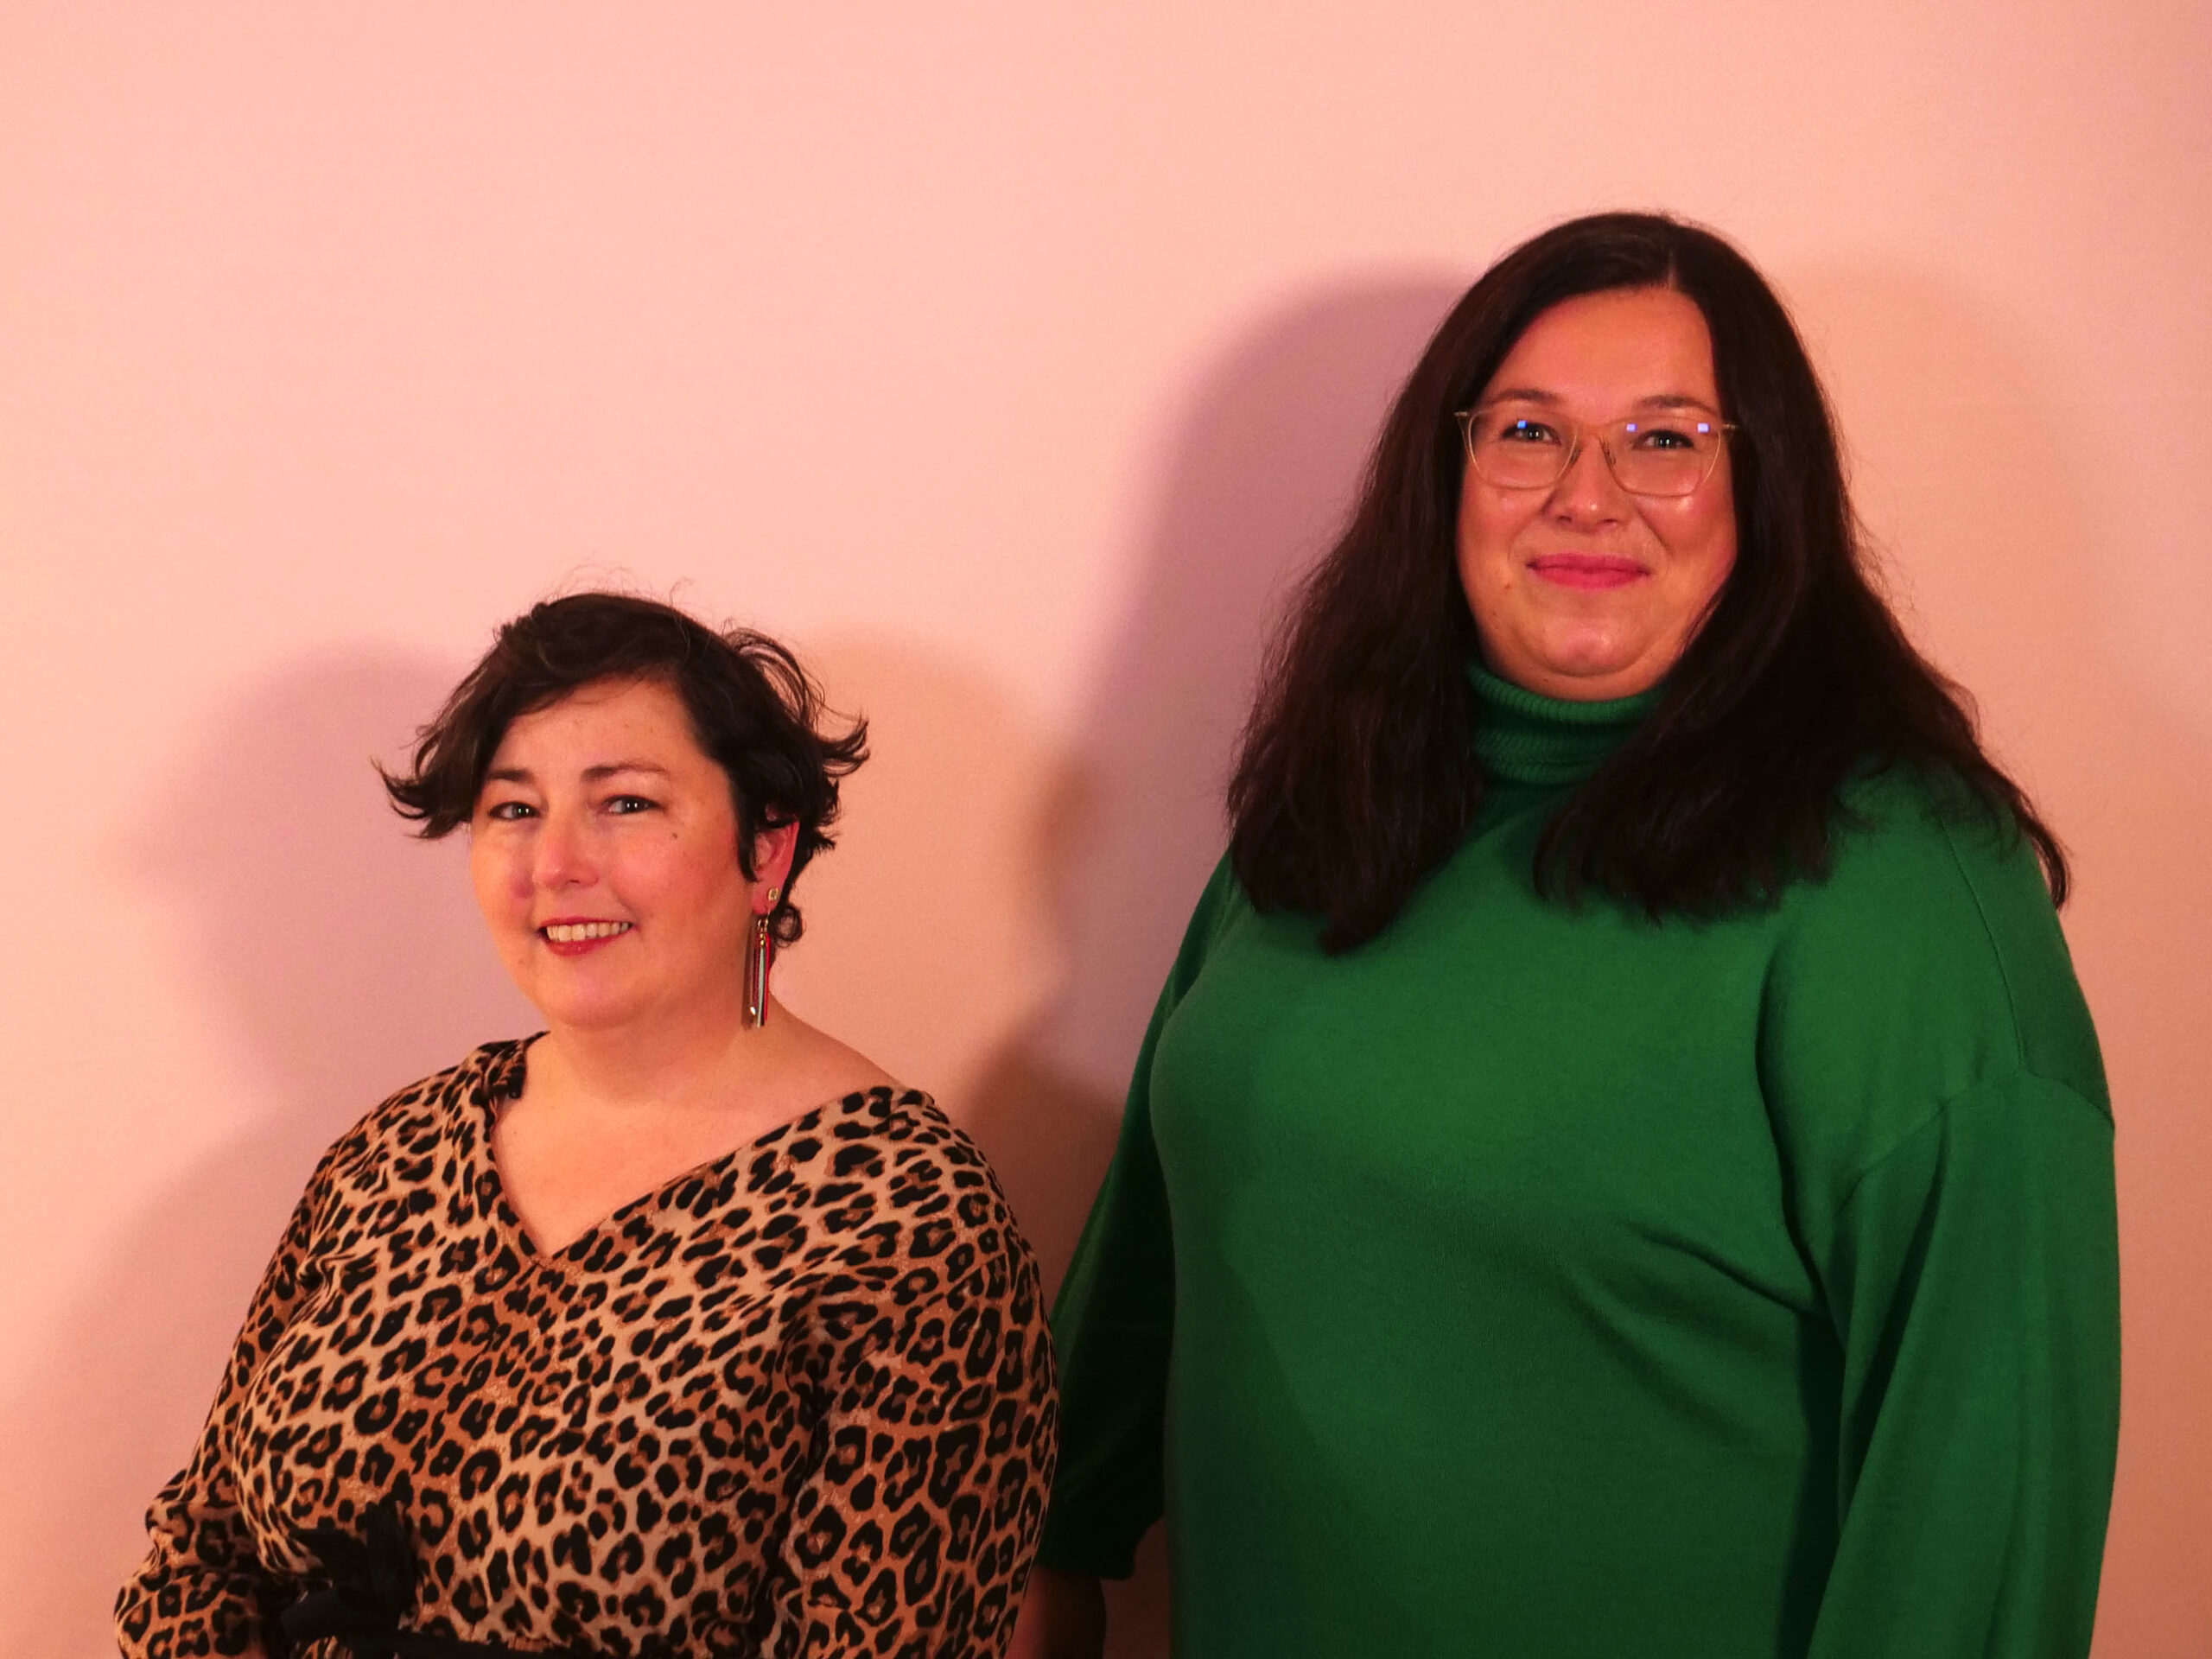 Stephanie Caruana og L. Sherman til Storydays